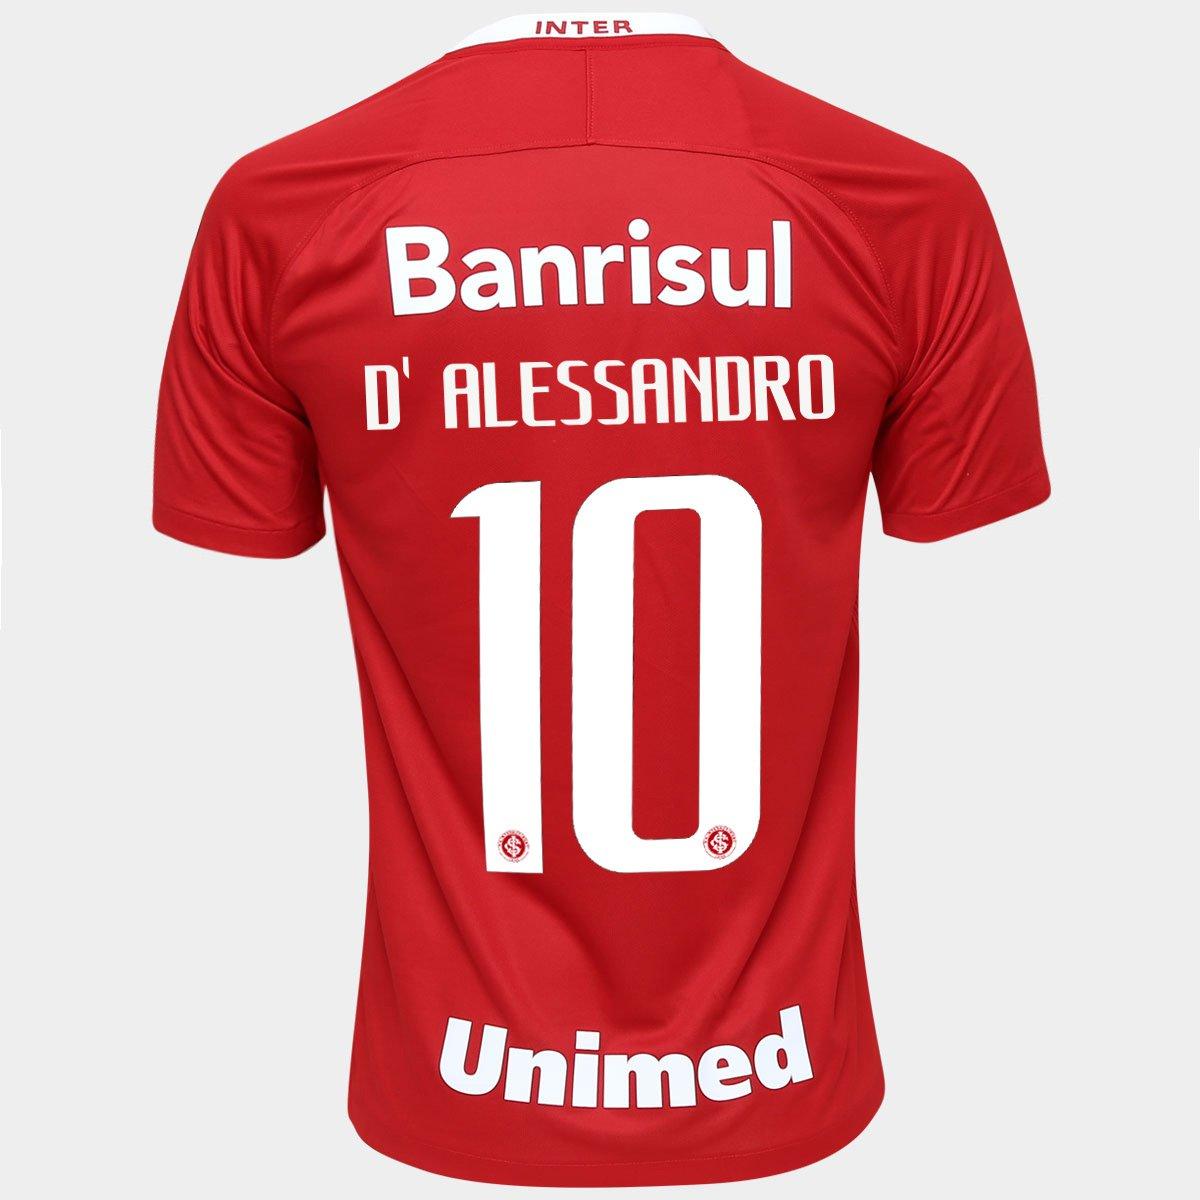 4826804f70f95 Camisa Nike Internacional I 2016 n° 10 - D  Alessandro - Compre Agora